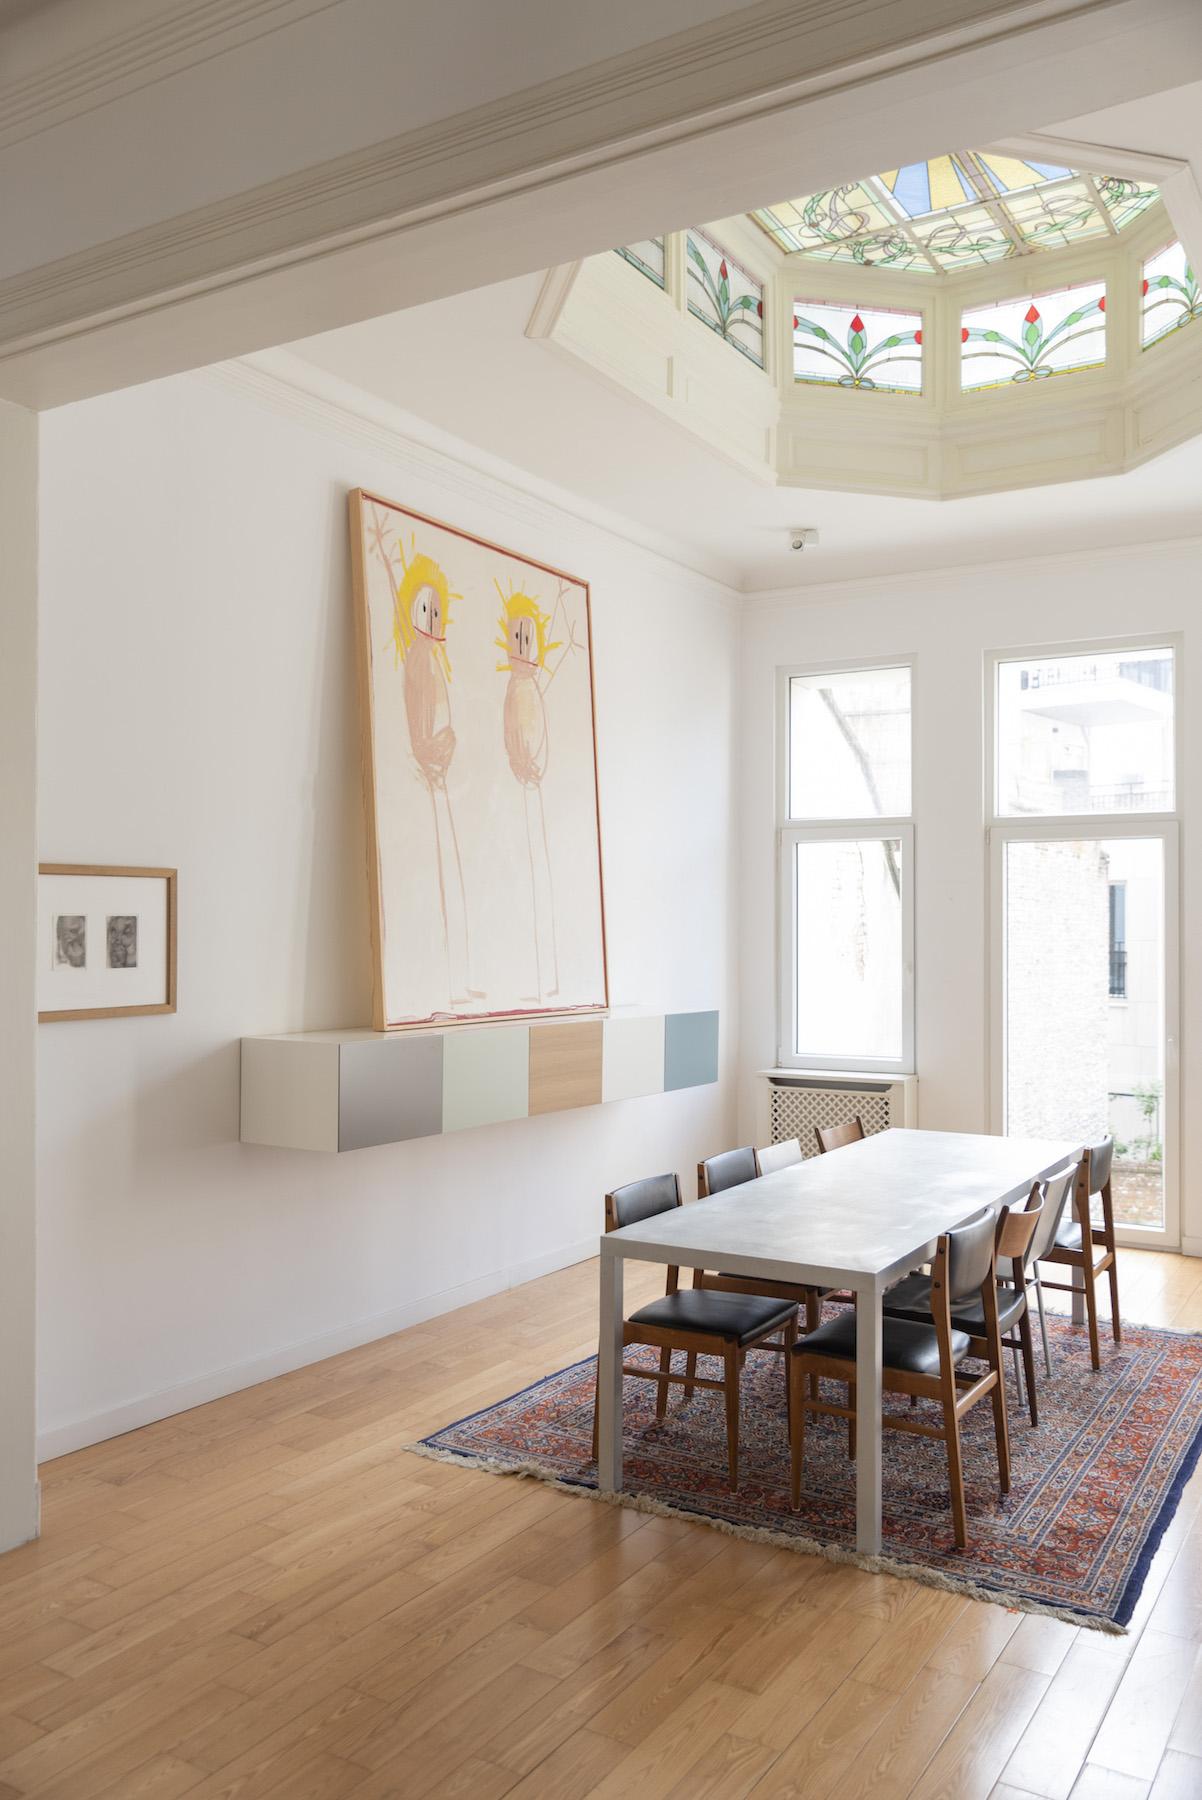 The kitchen with work by Fabrice Samyn and Andi Fischer. Photo: Alexandra Bertels. Courtesy of Joris Beernaert.